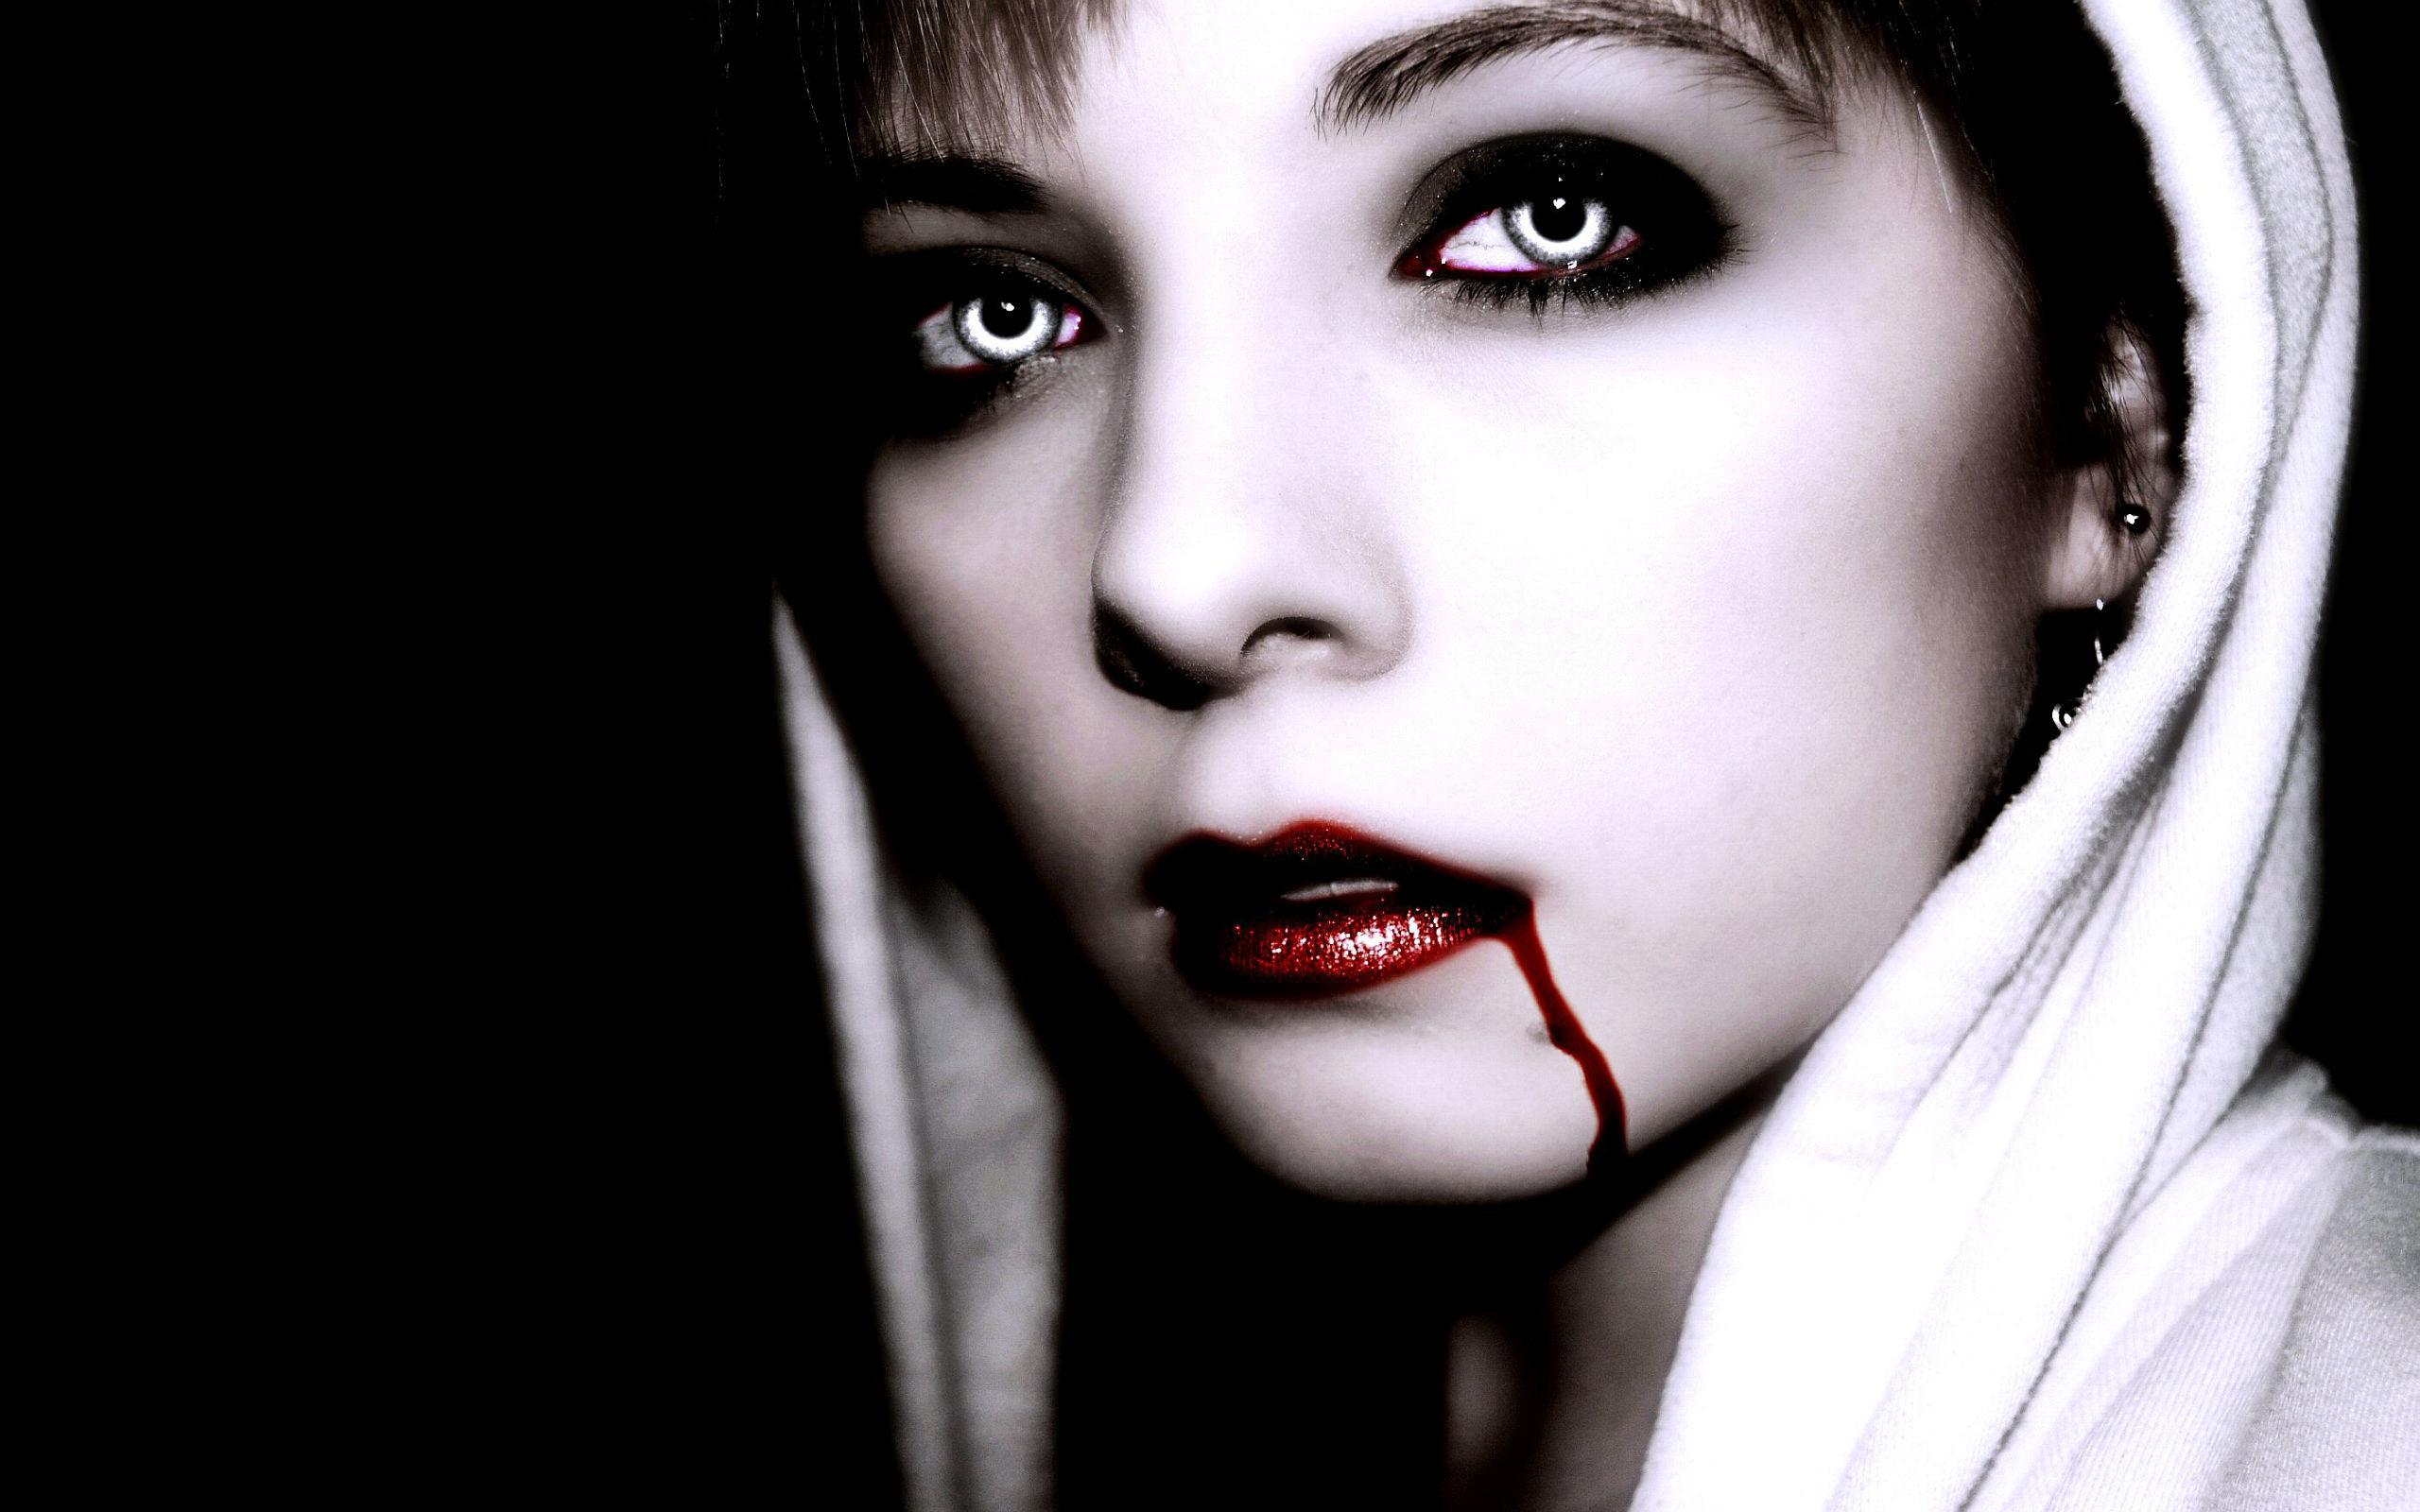 Vampire Widescreen Wallpaper